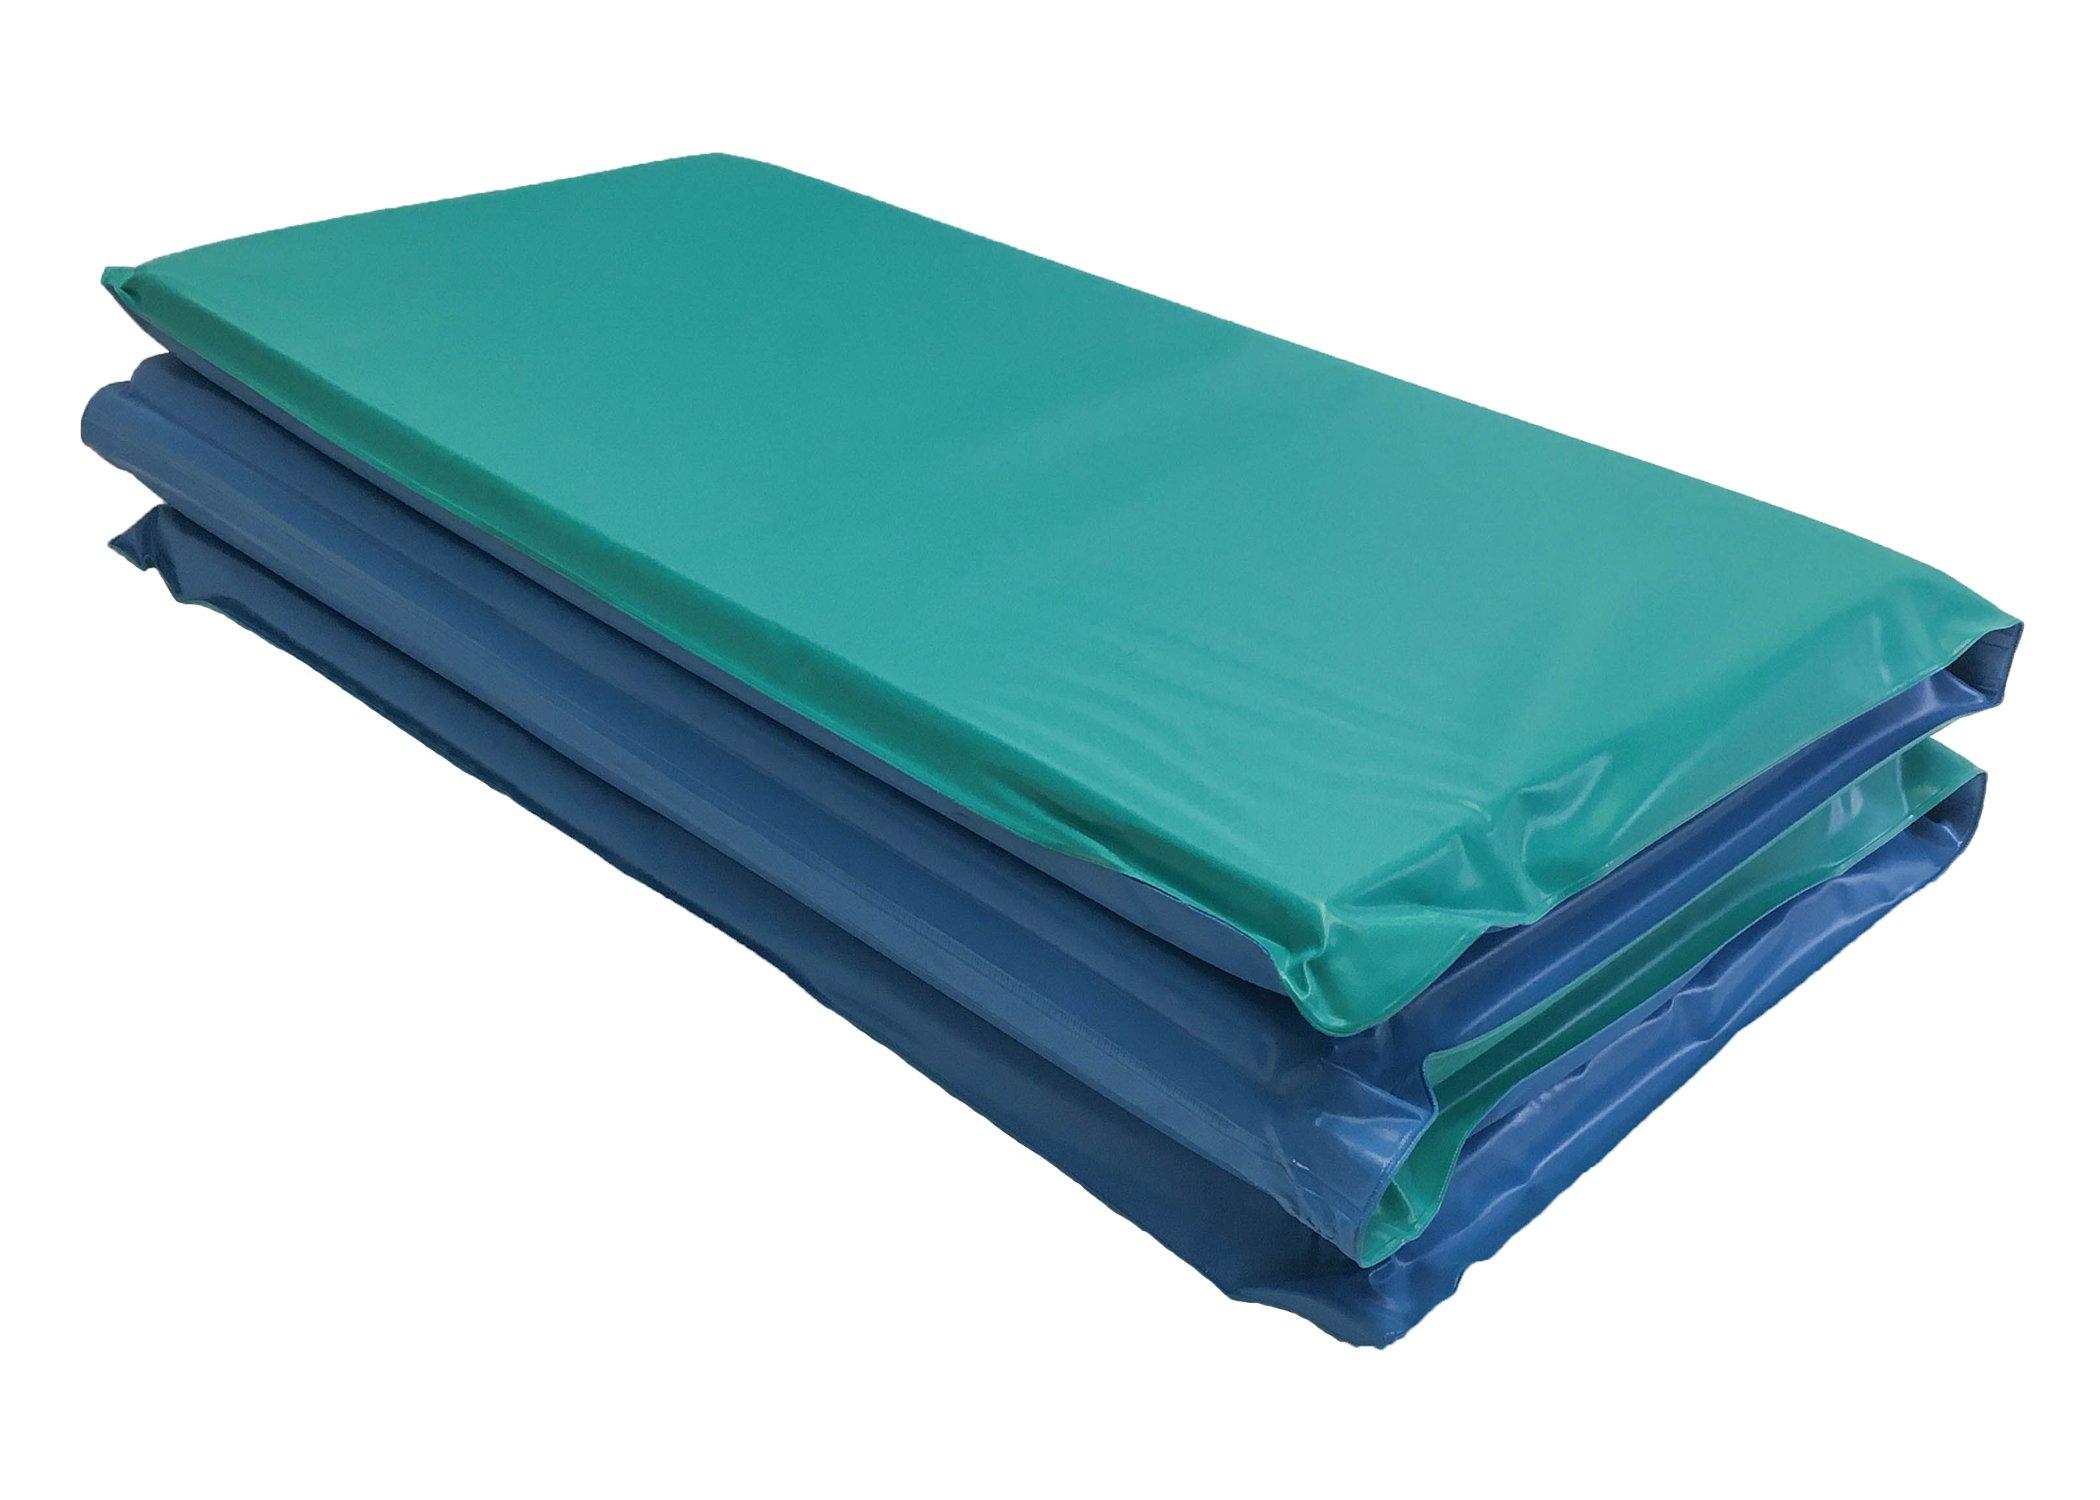 KinderMat DayDreamer Rest Mat, 1 Inch Thick, Blue/Teal, 10-mil Vinyl